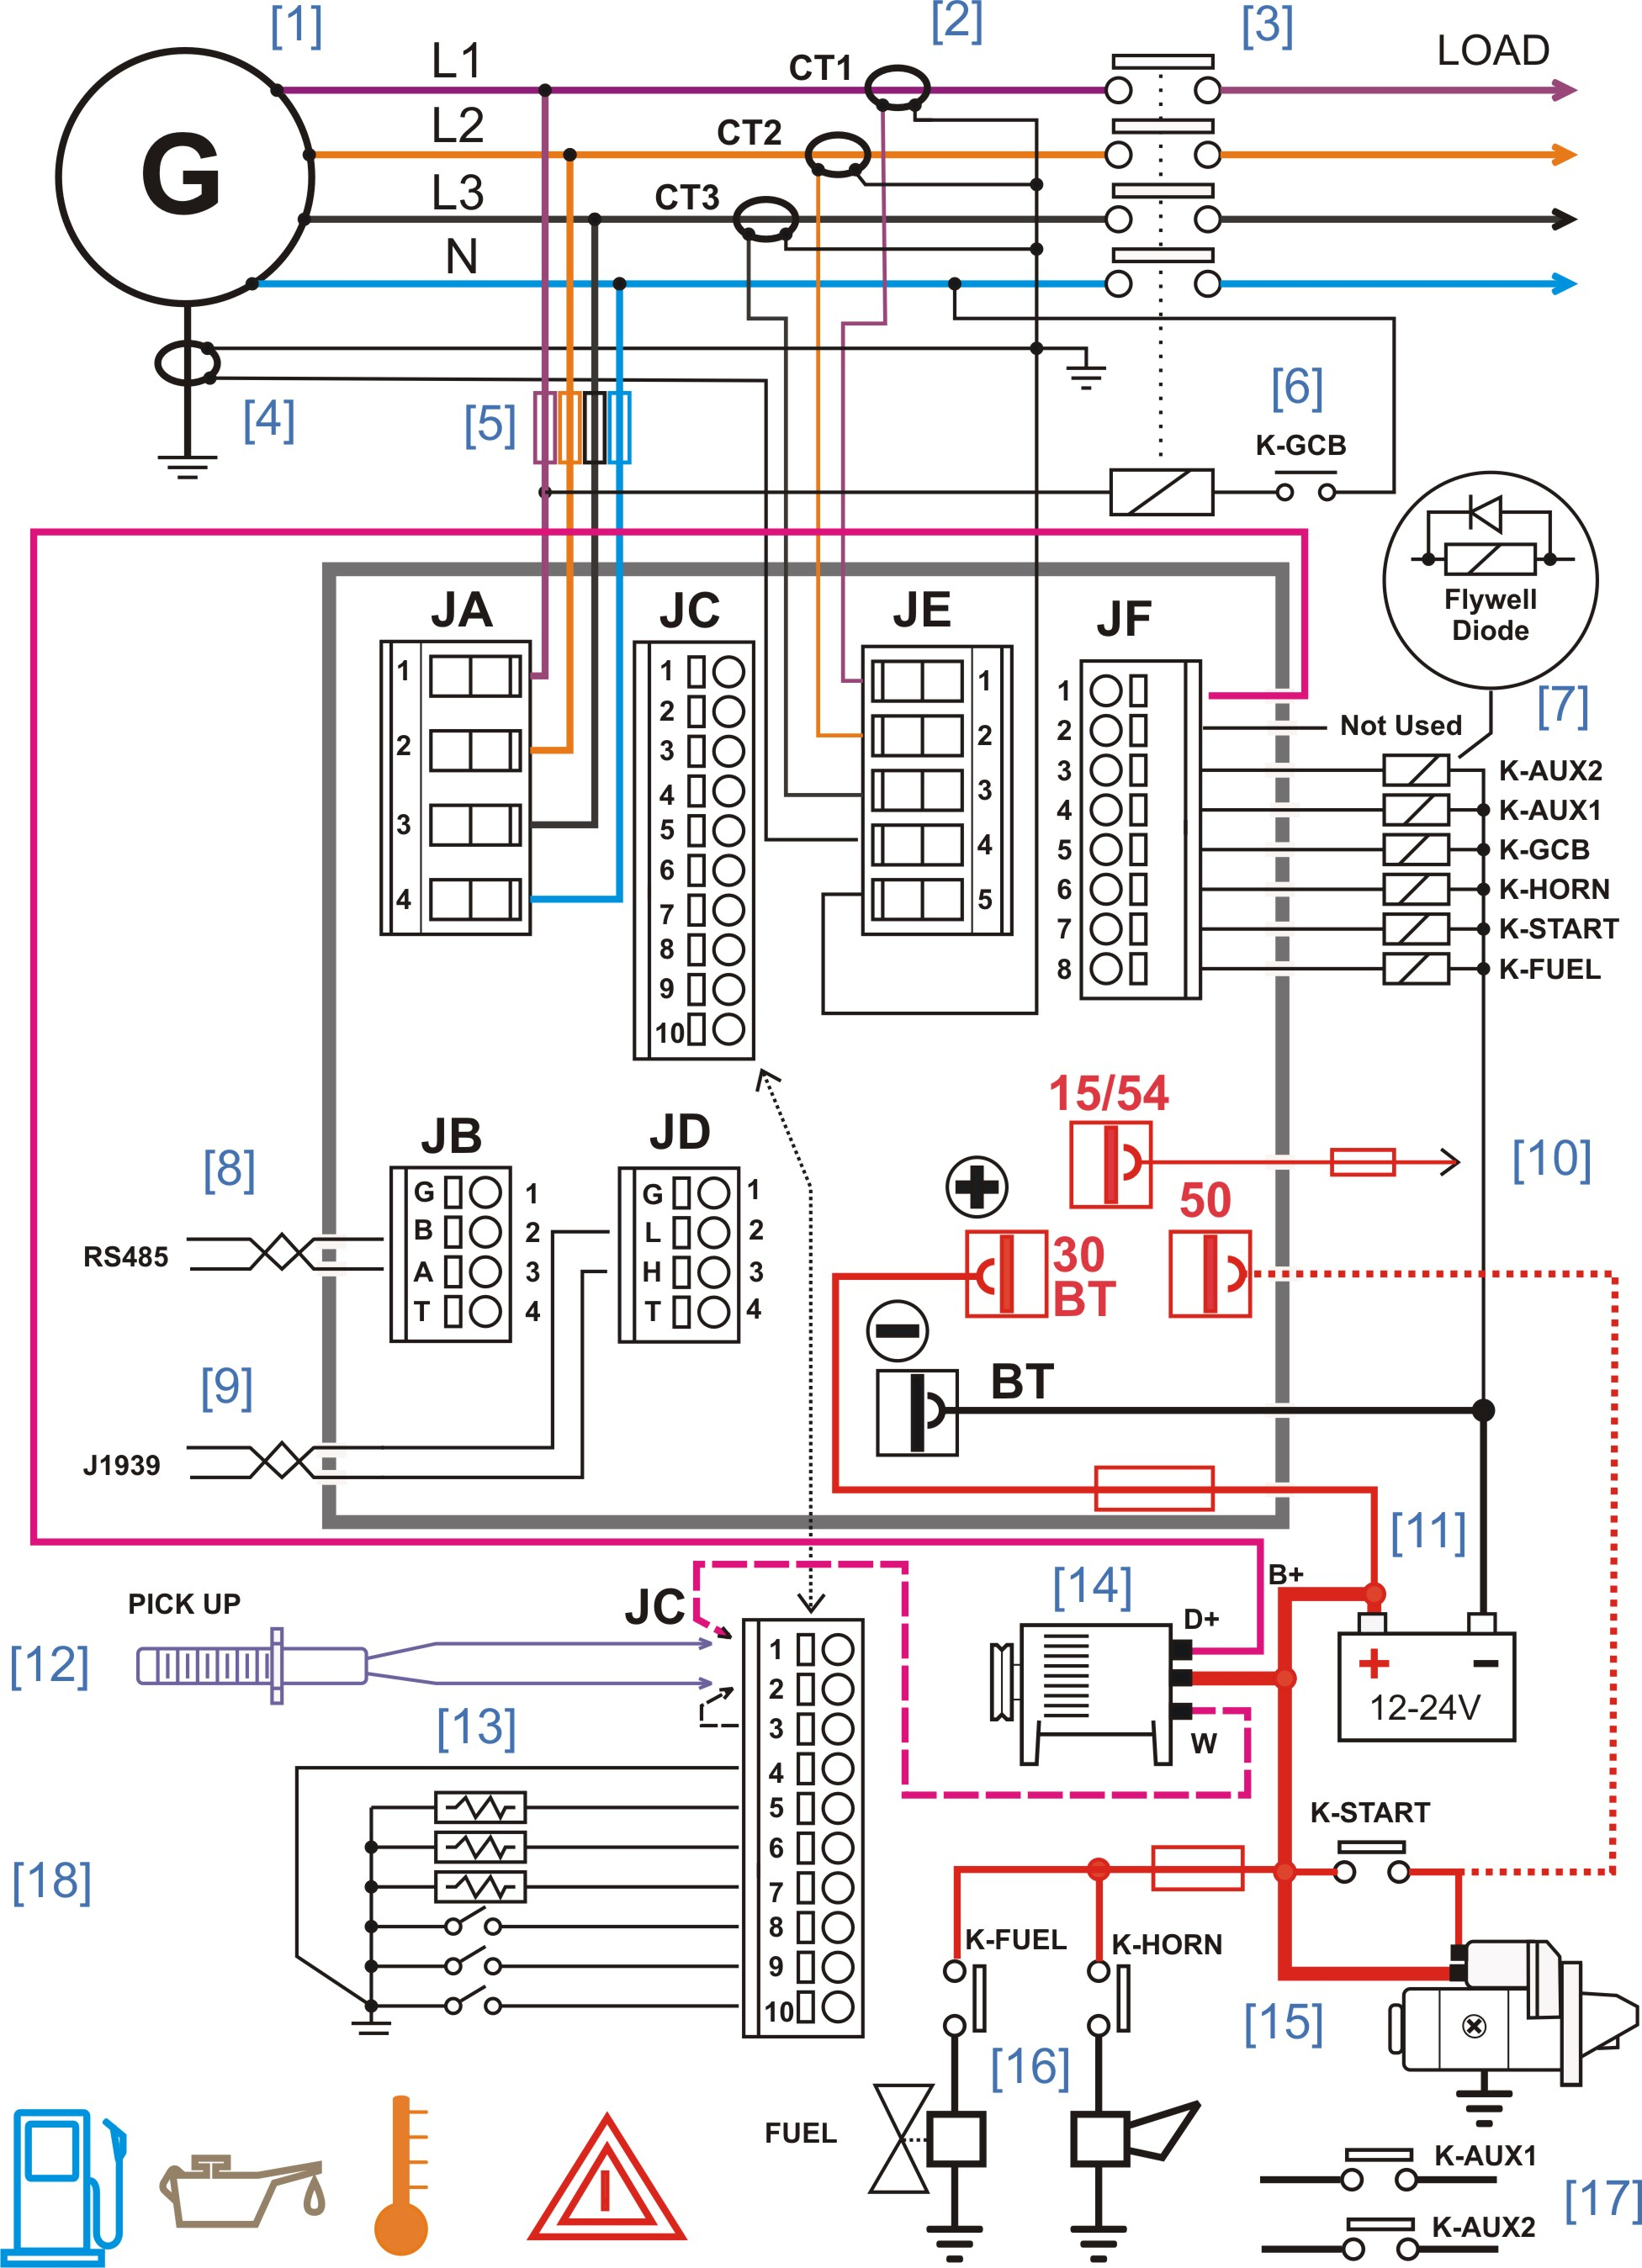 Fine 11Kv Control Panel Wiring Diagram Wiring Diagram Wiring Cloud Hisonuggs Outletorg